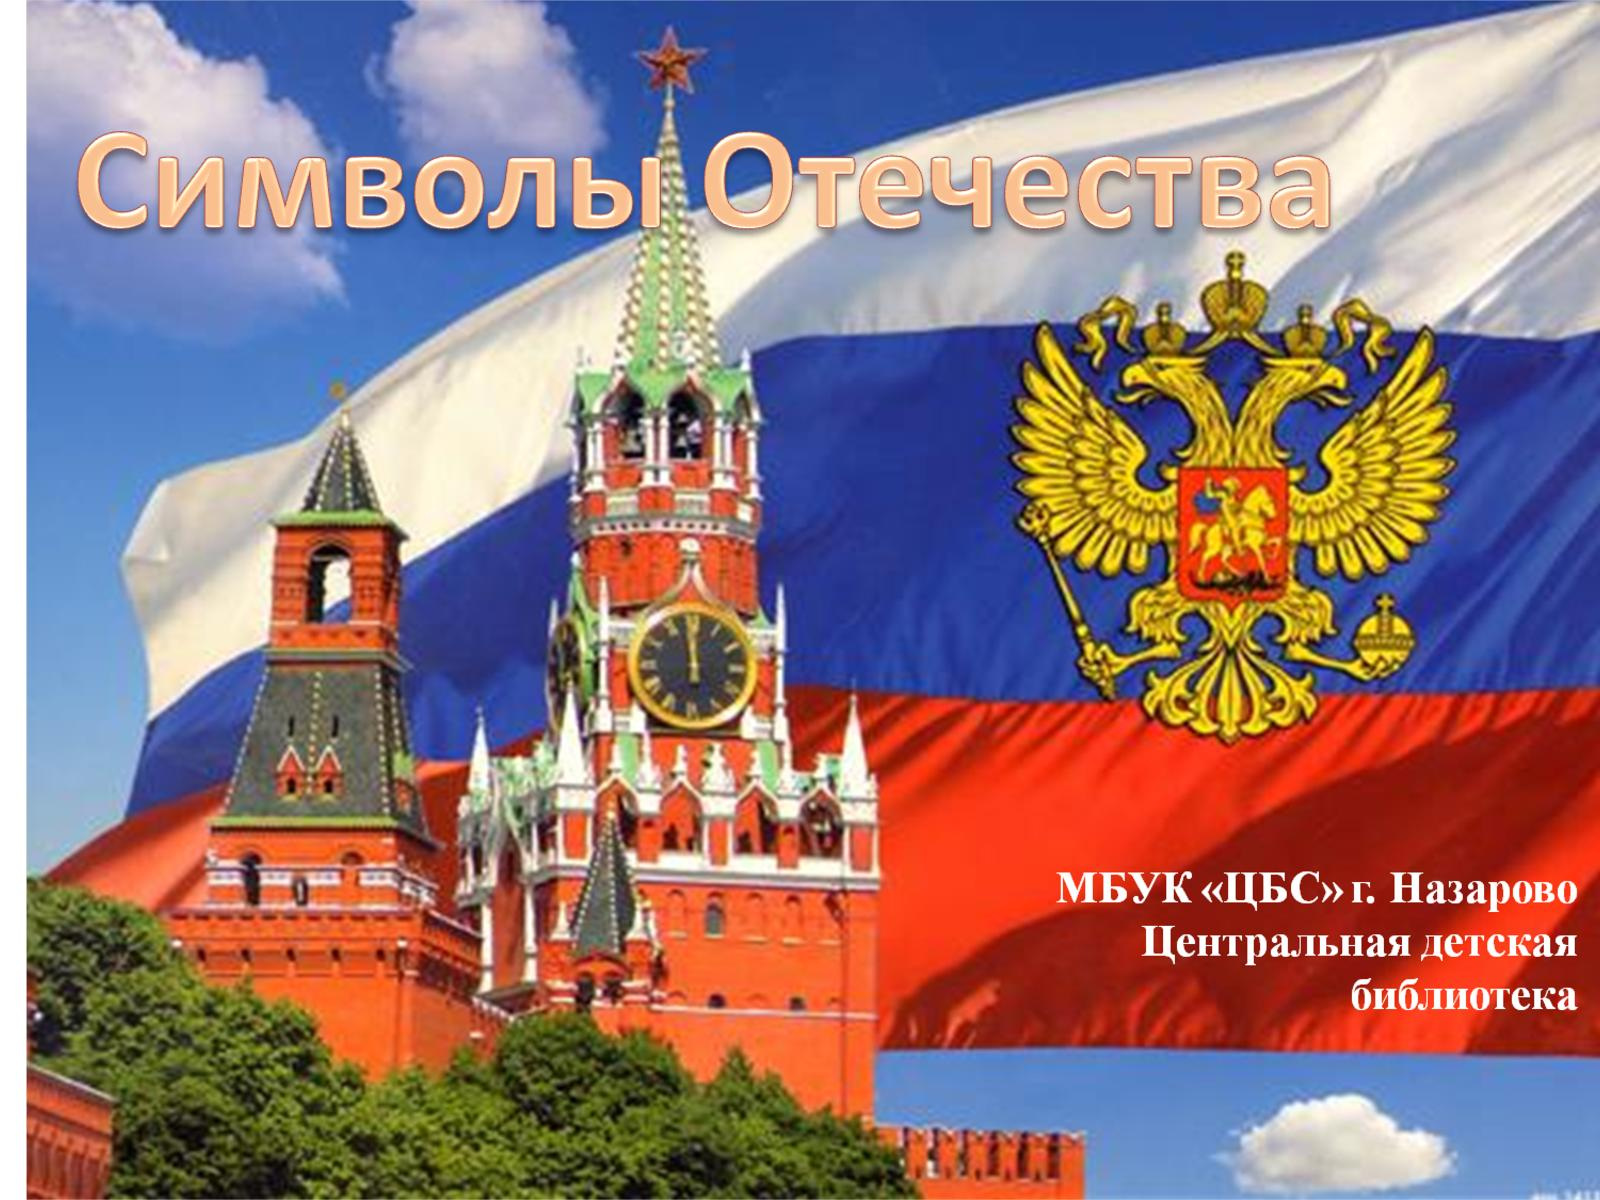 Картинки фото с символами россии